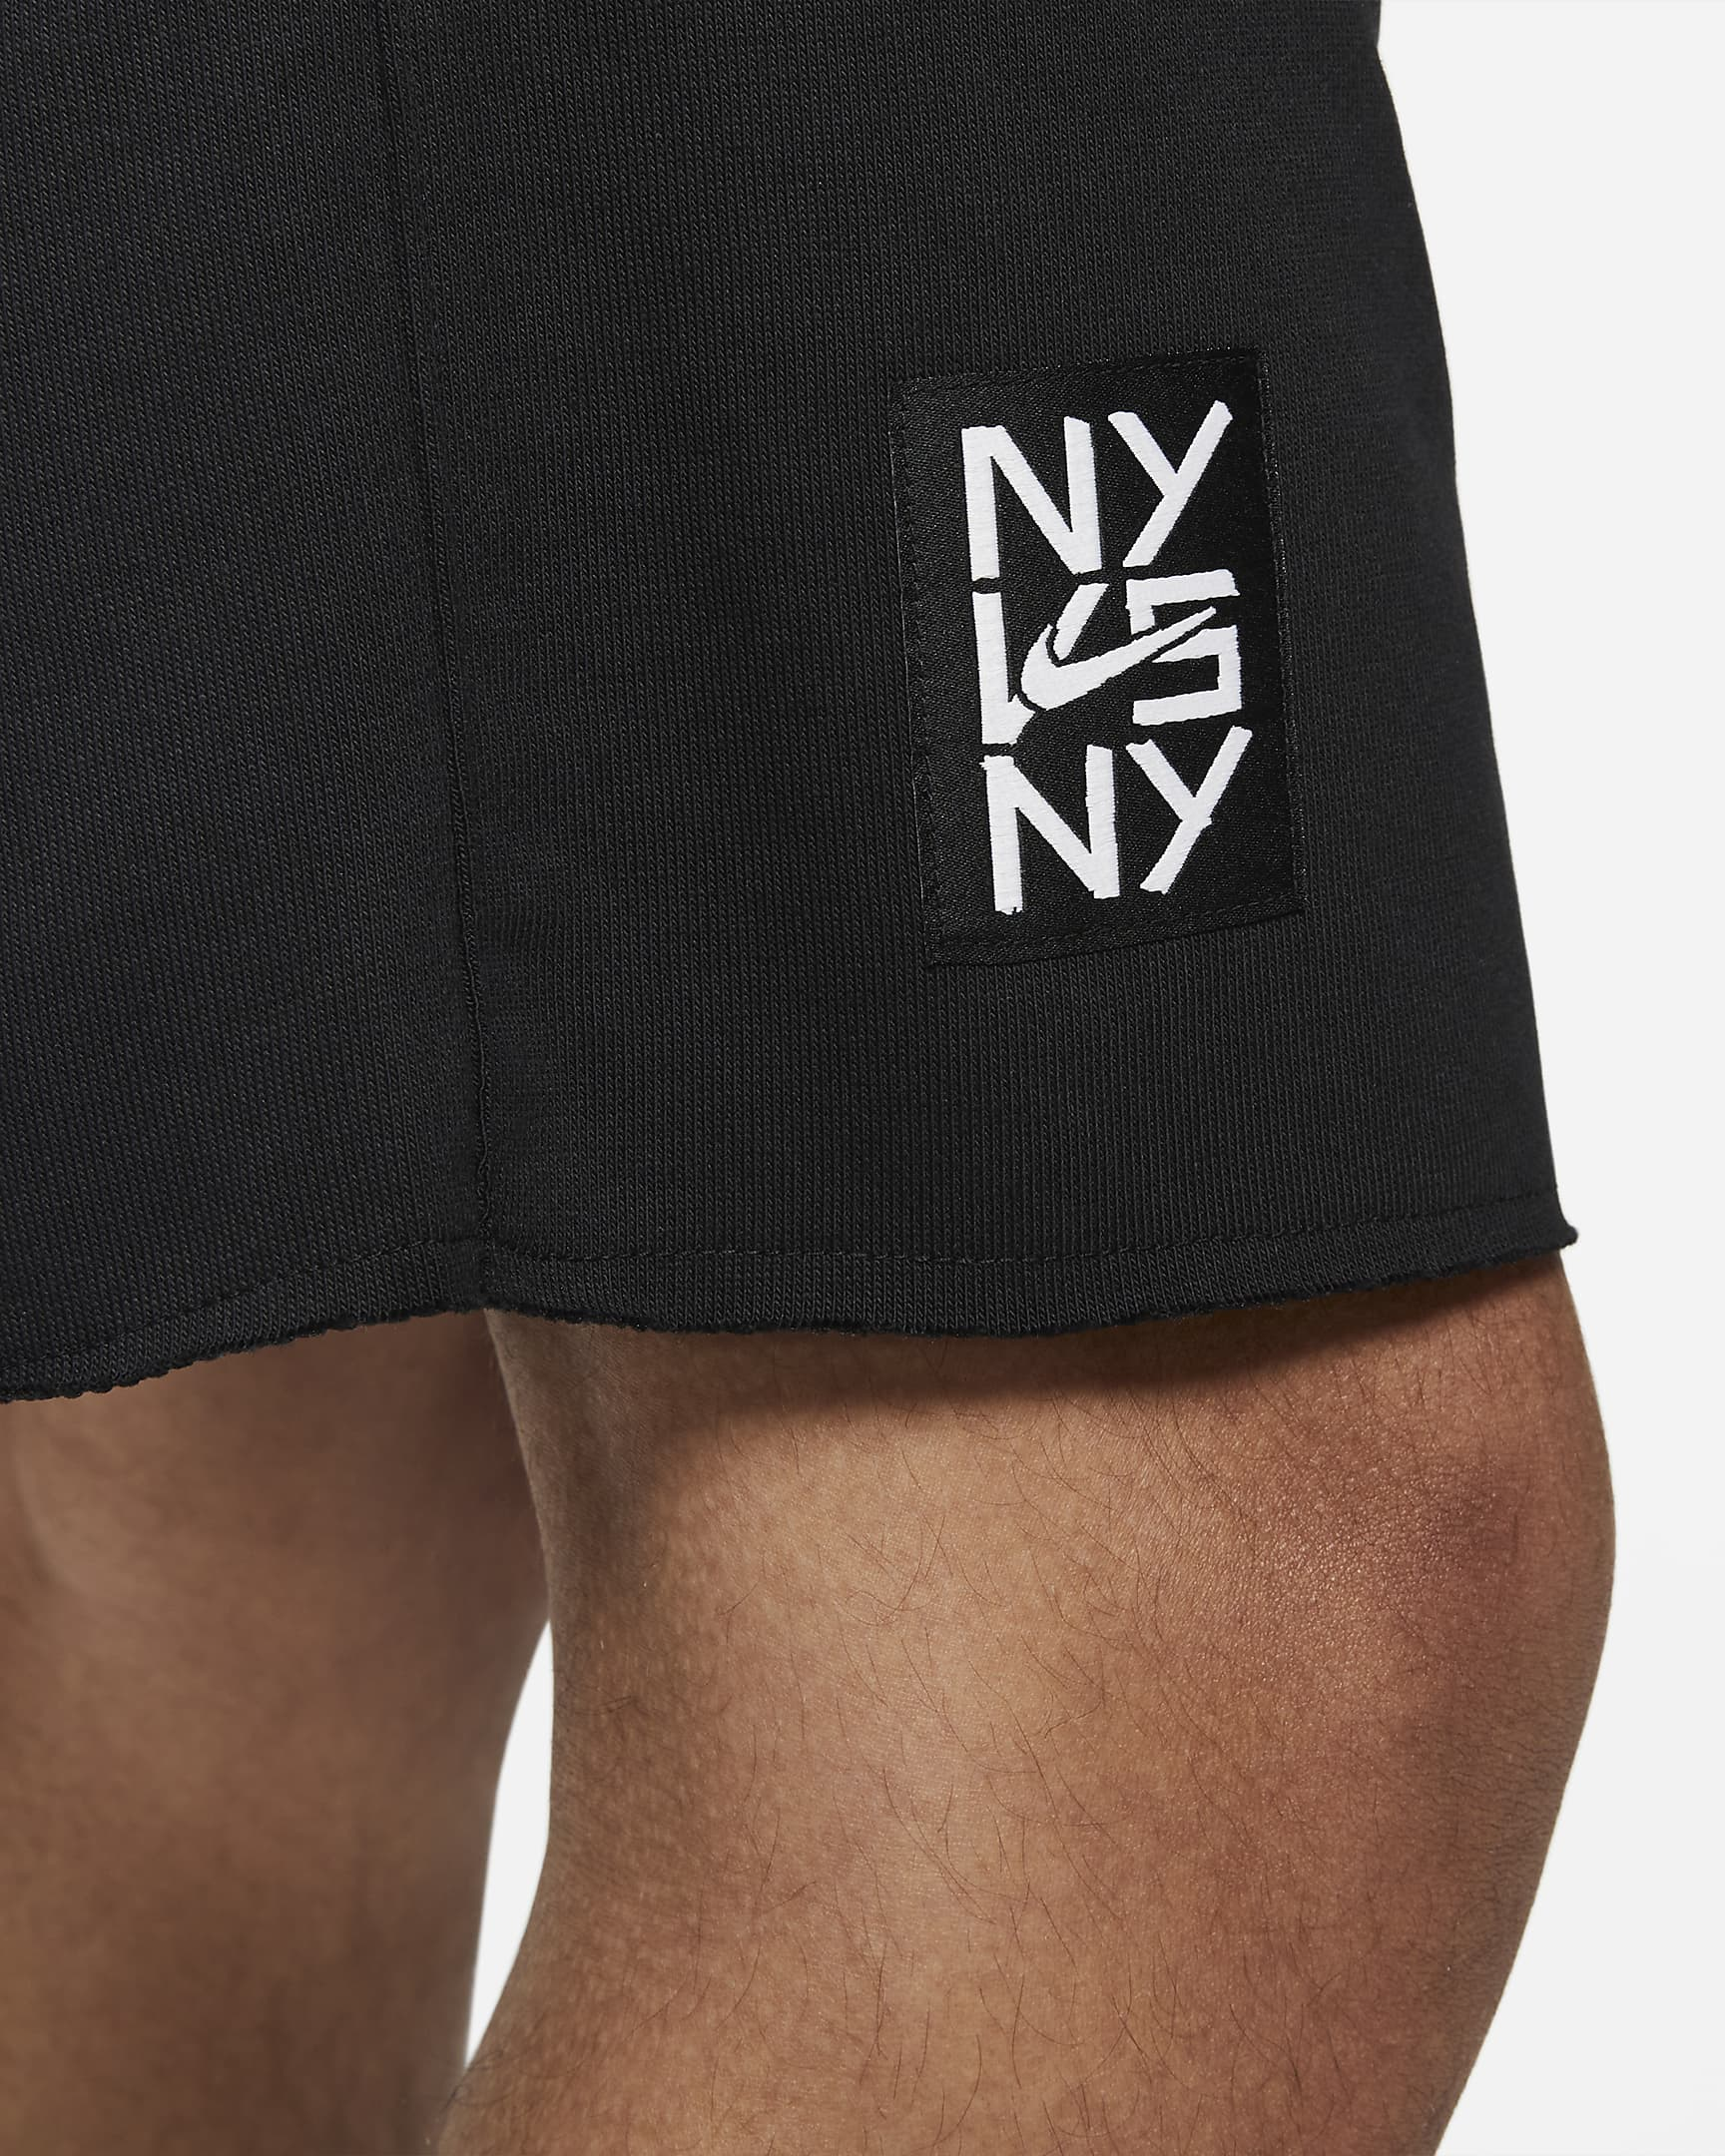 standard-issue-lincoln-park-mens-basketball-fleece-shorts-Wjf9fz-3.png